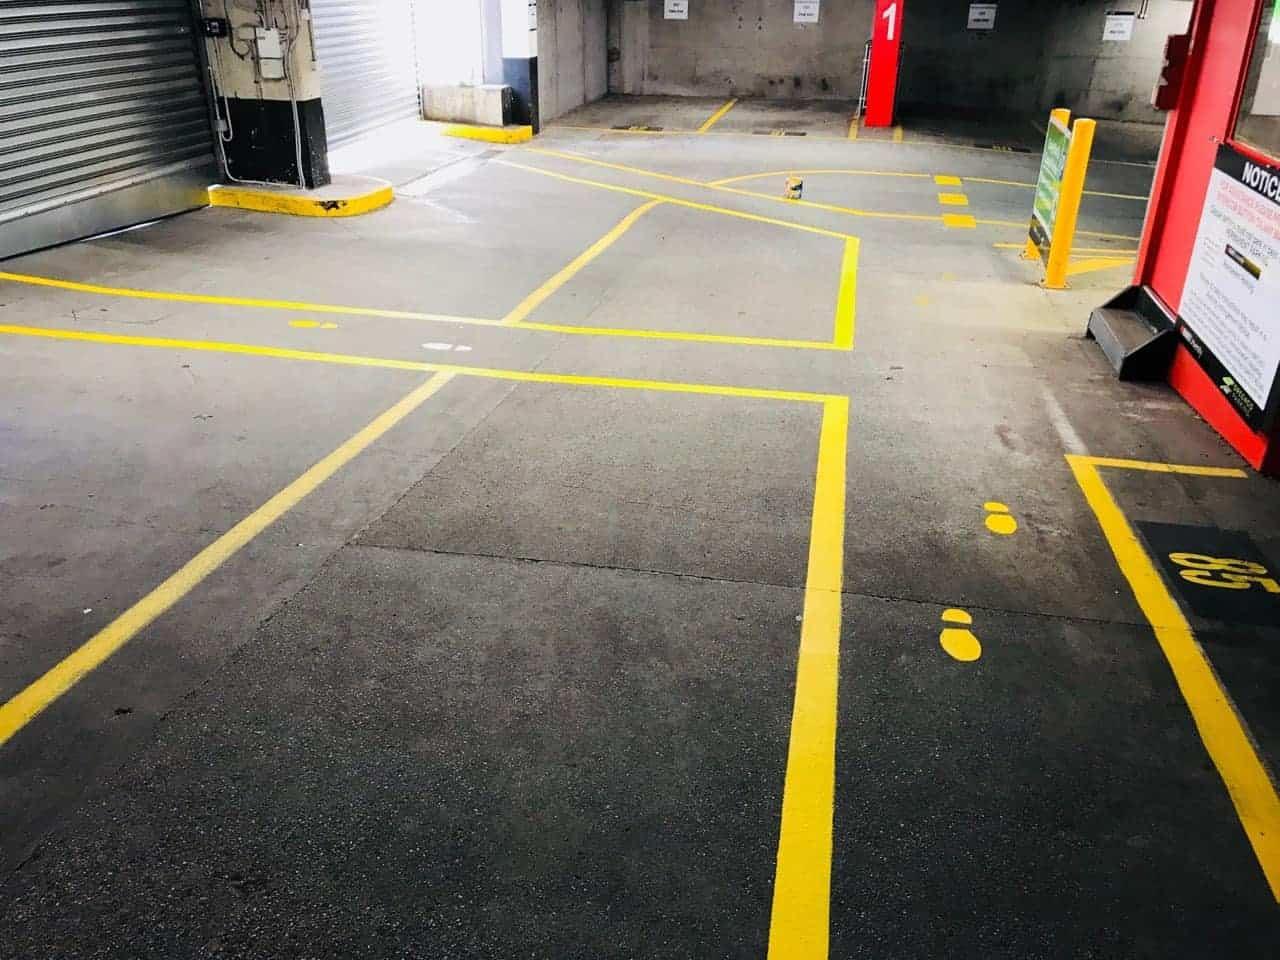 Carpark linemarking pic3